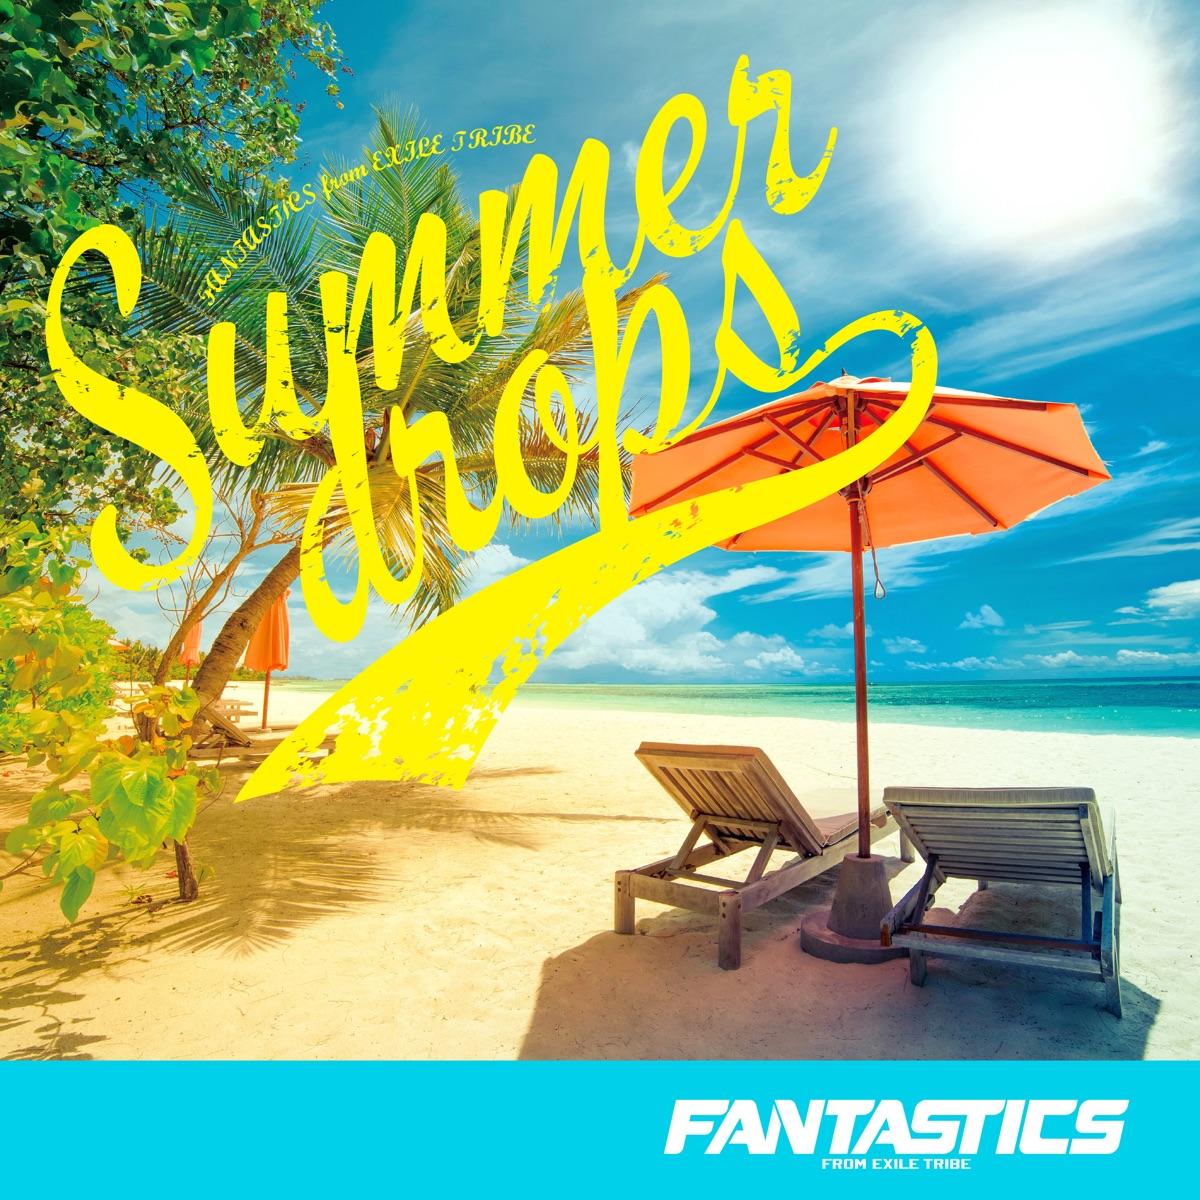 『FANTASTICS from EXILE TRIBE - Summer drops』収録の『Summer drops』ジャケット